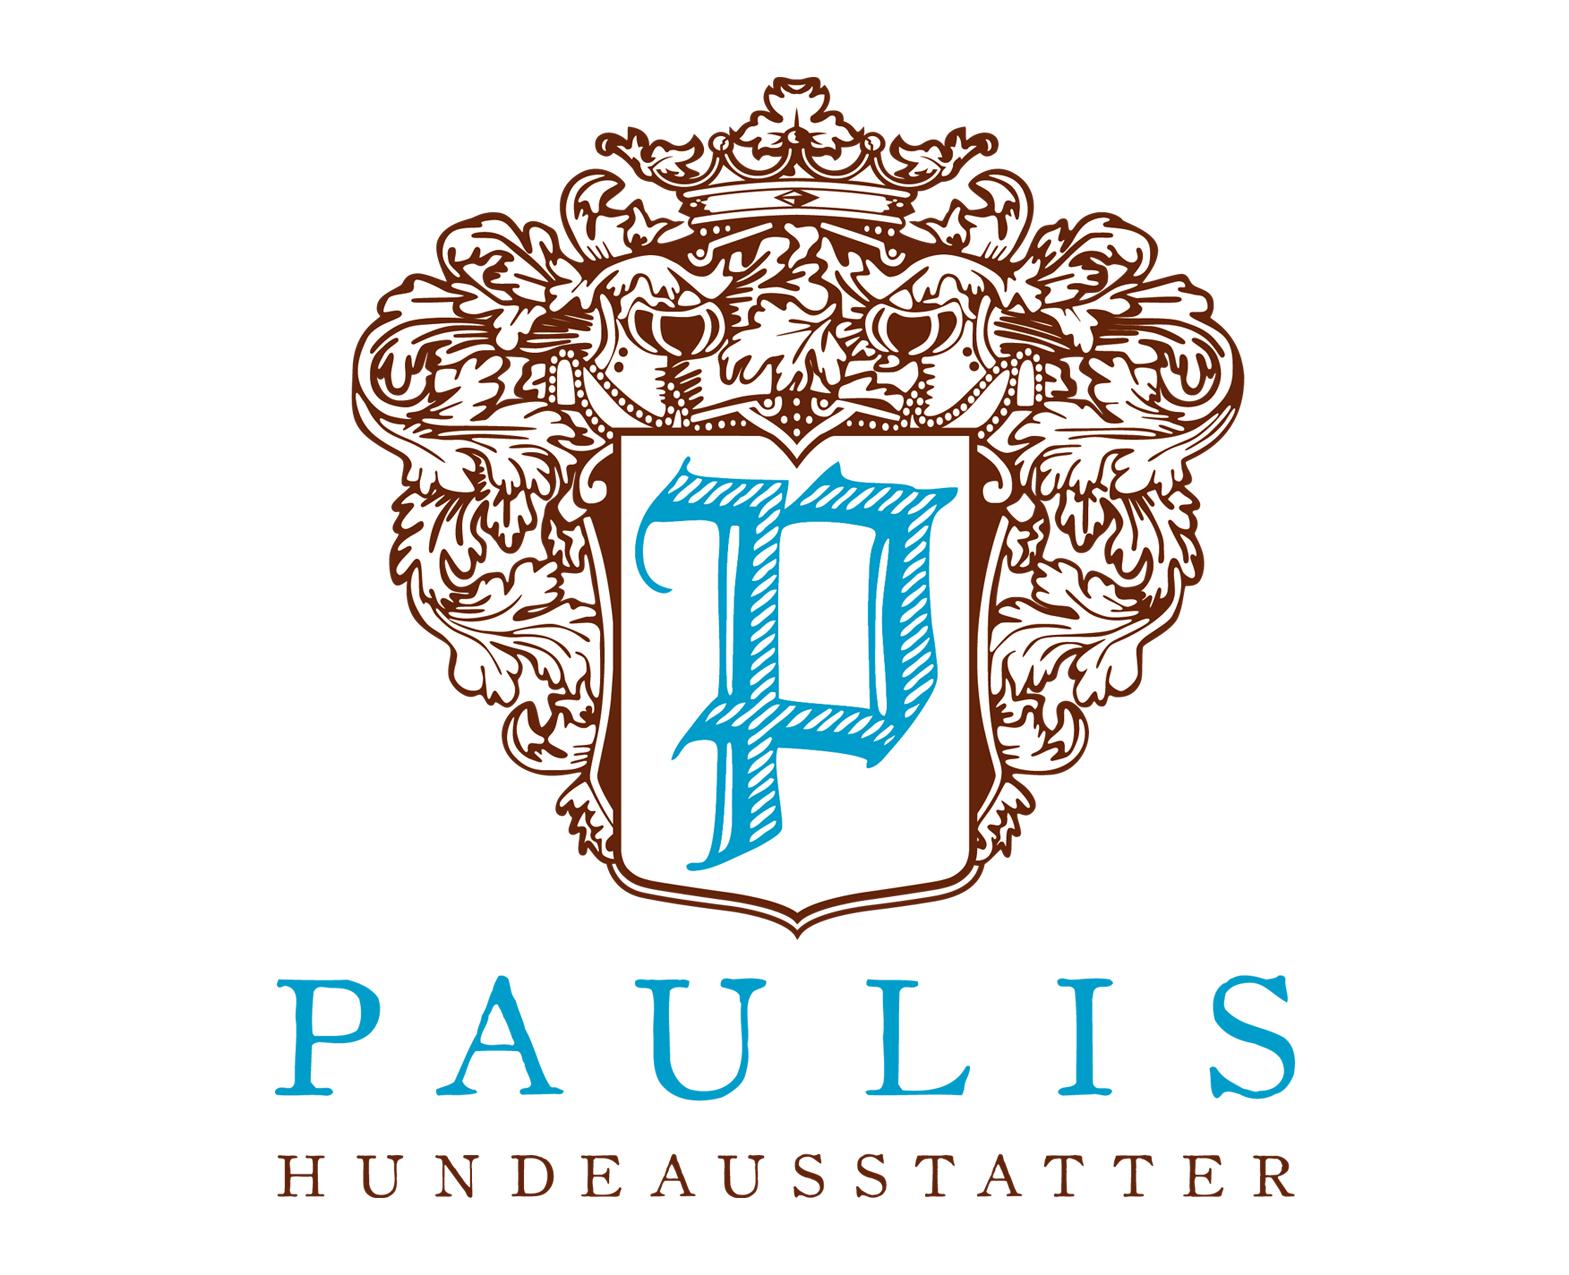 Paulis Hundeaustatter - Gymnasiumstraße 641190 Wien